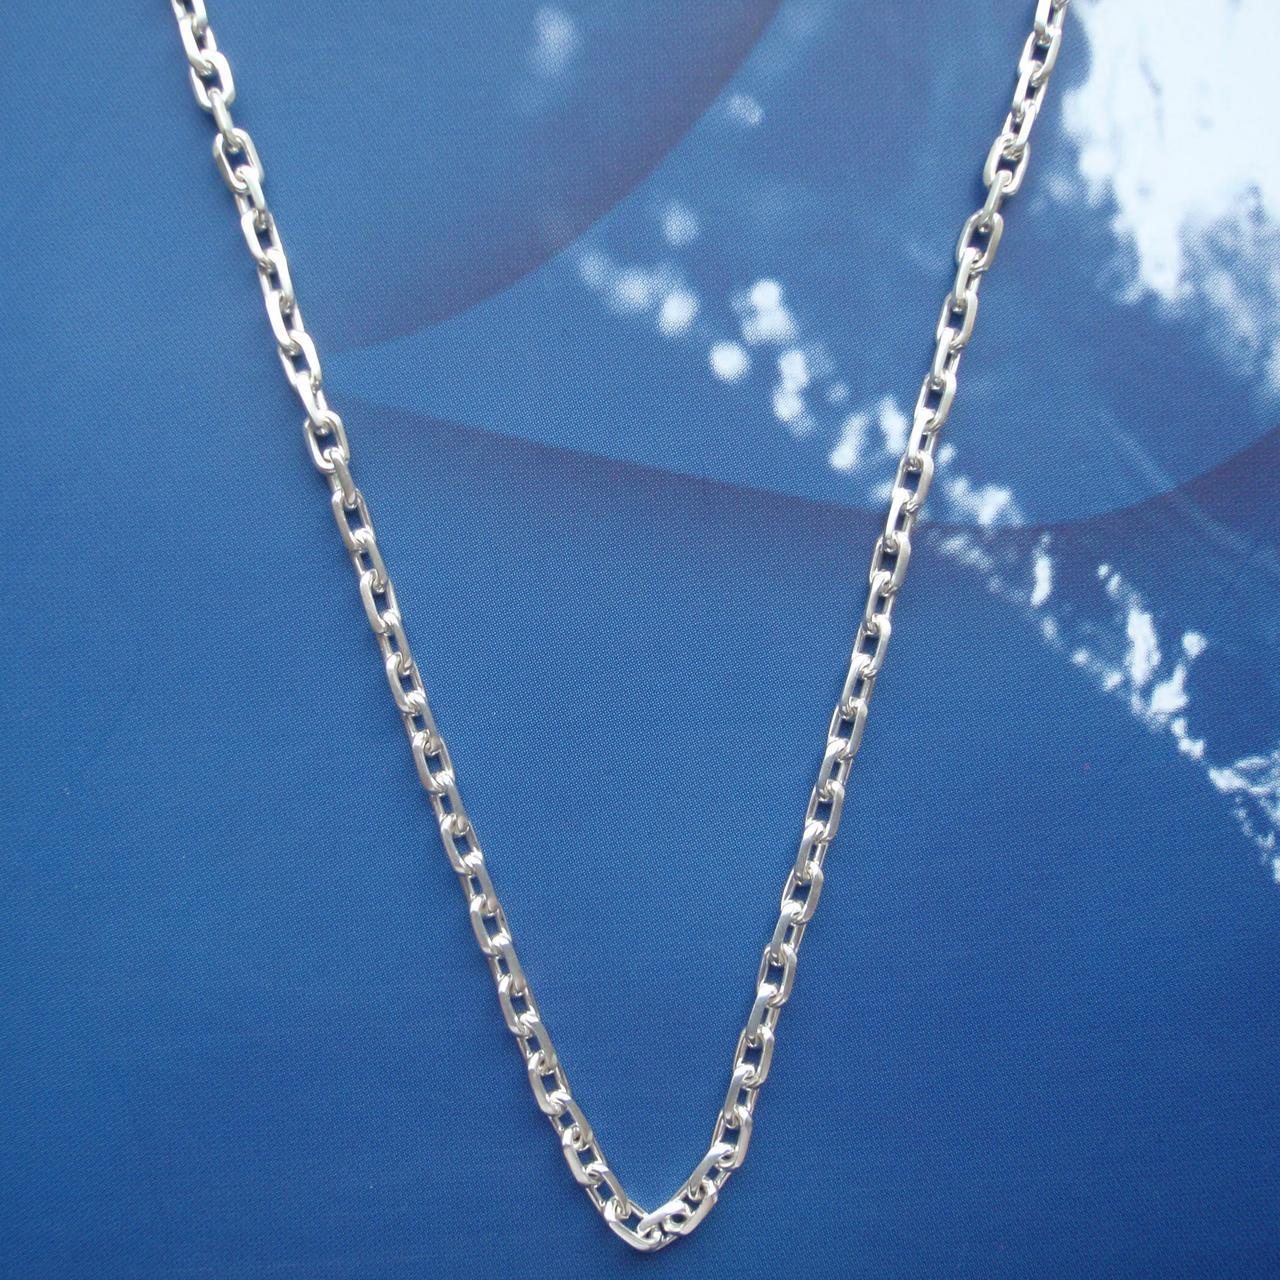 Серебряная цепочка, 550мм,10 грамм, якорное плетение